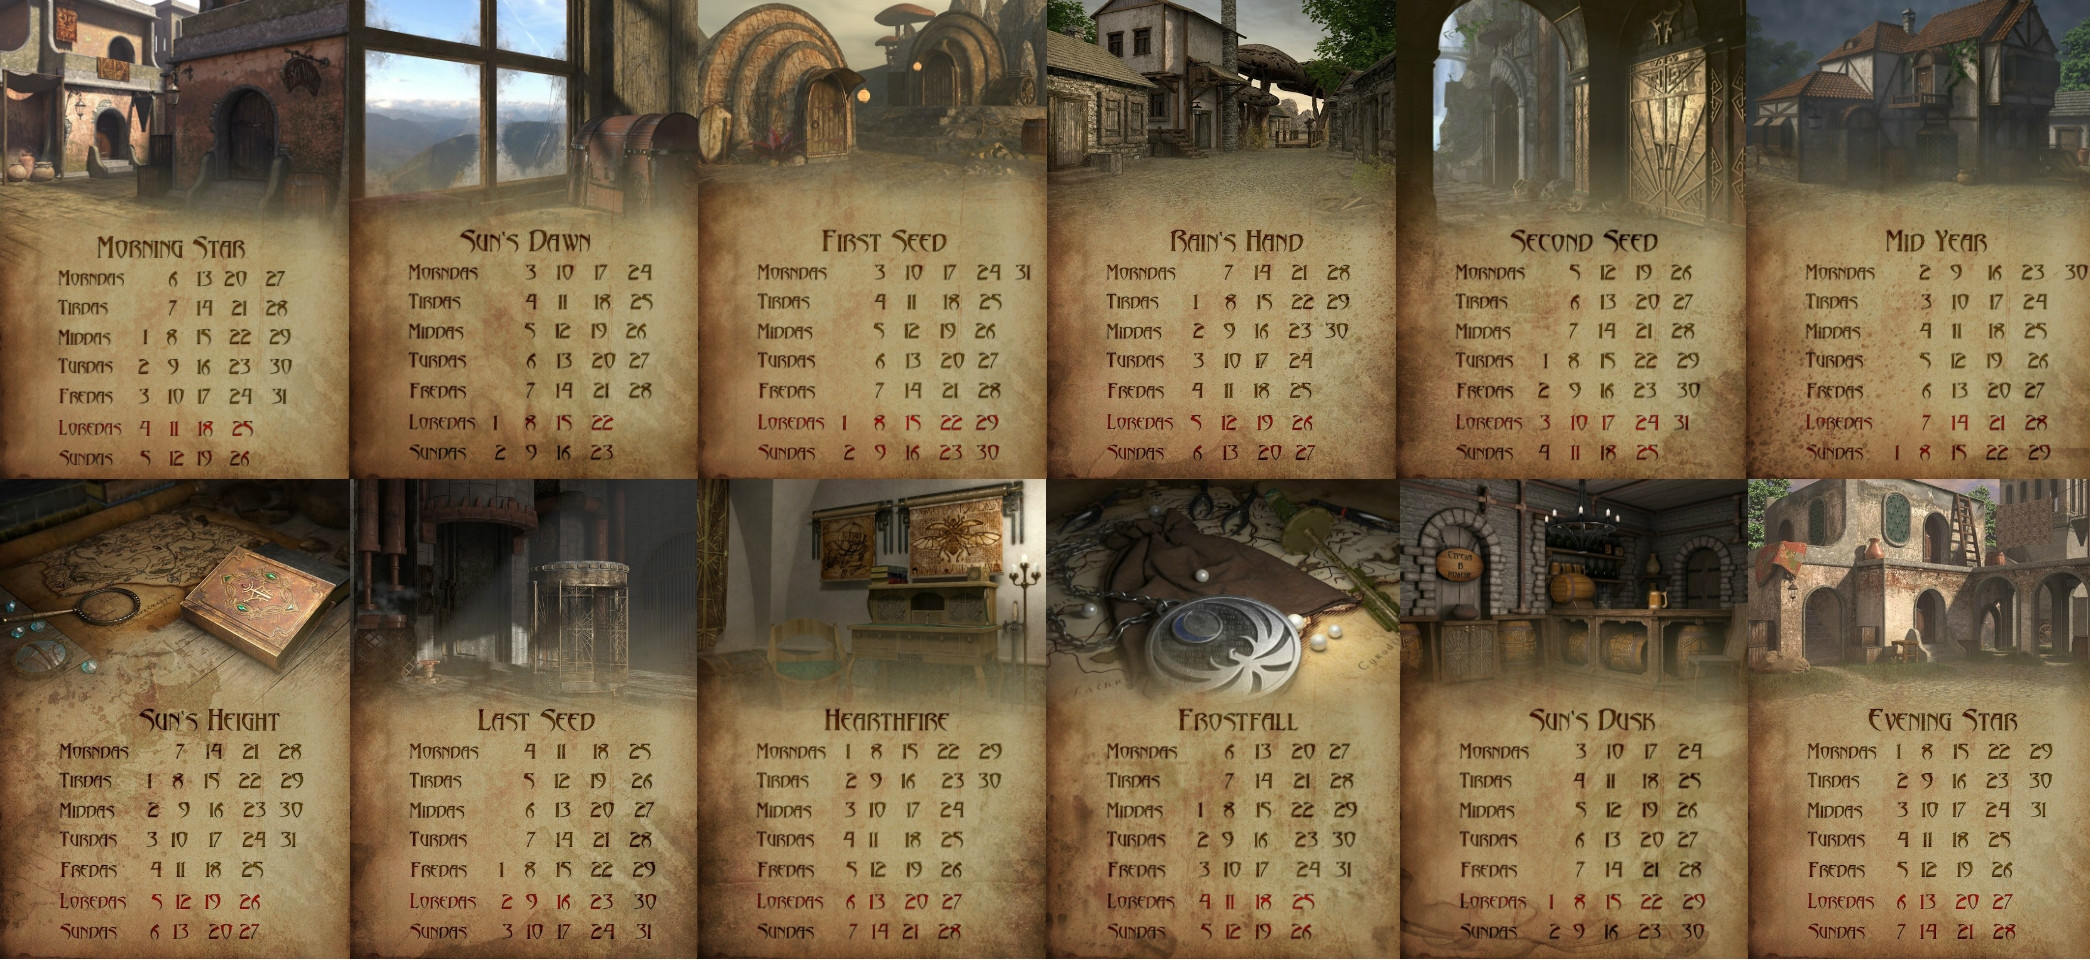 Elder Scrolls Calendar